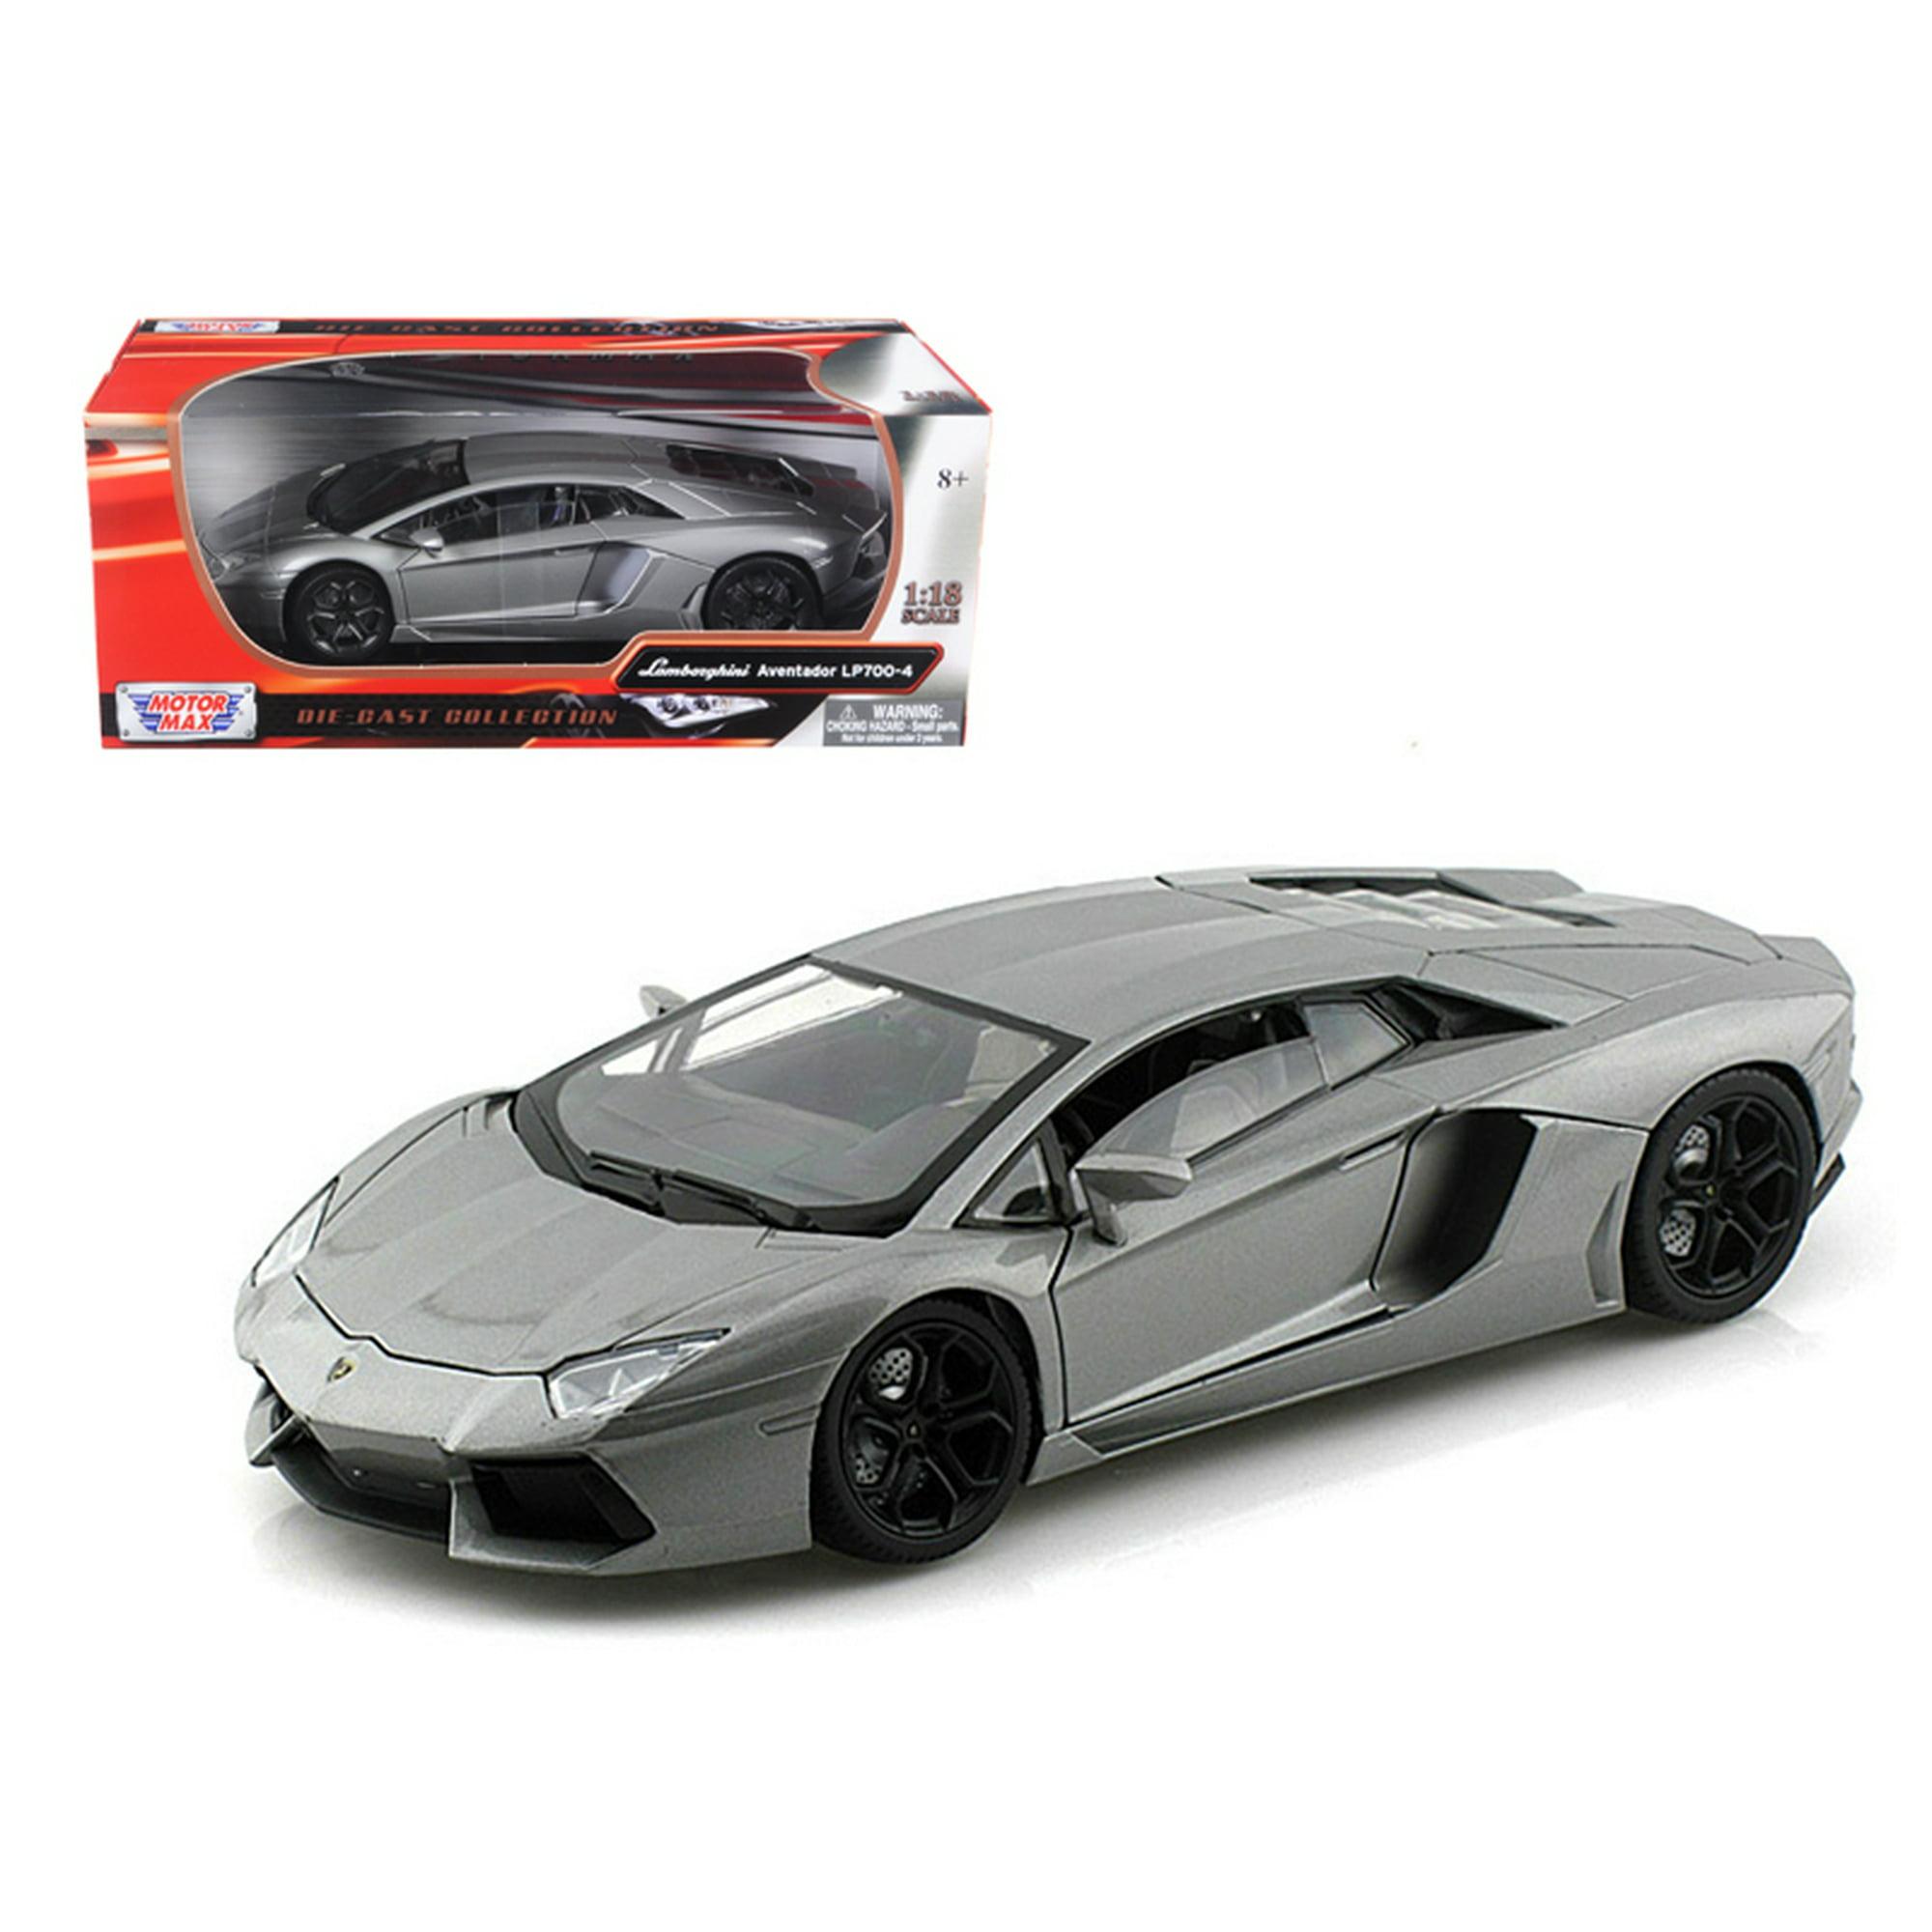 Lamborghini Aventador Lp700 4 Grey 1 18 Diecast Car Model By